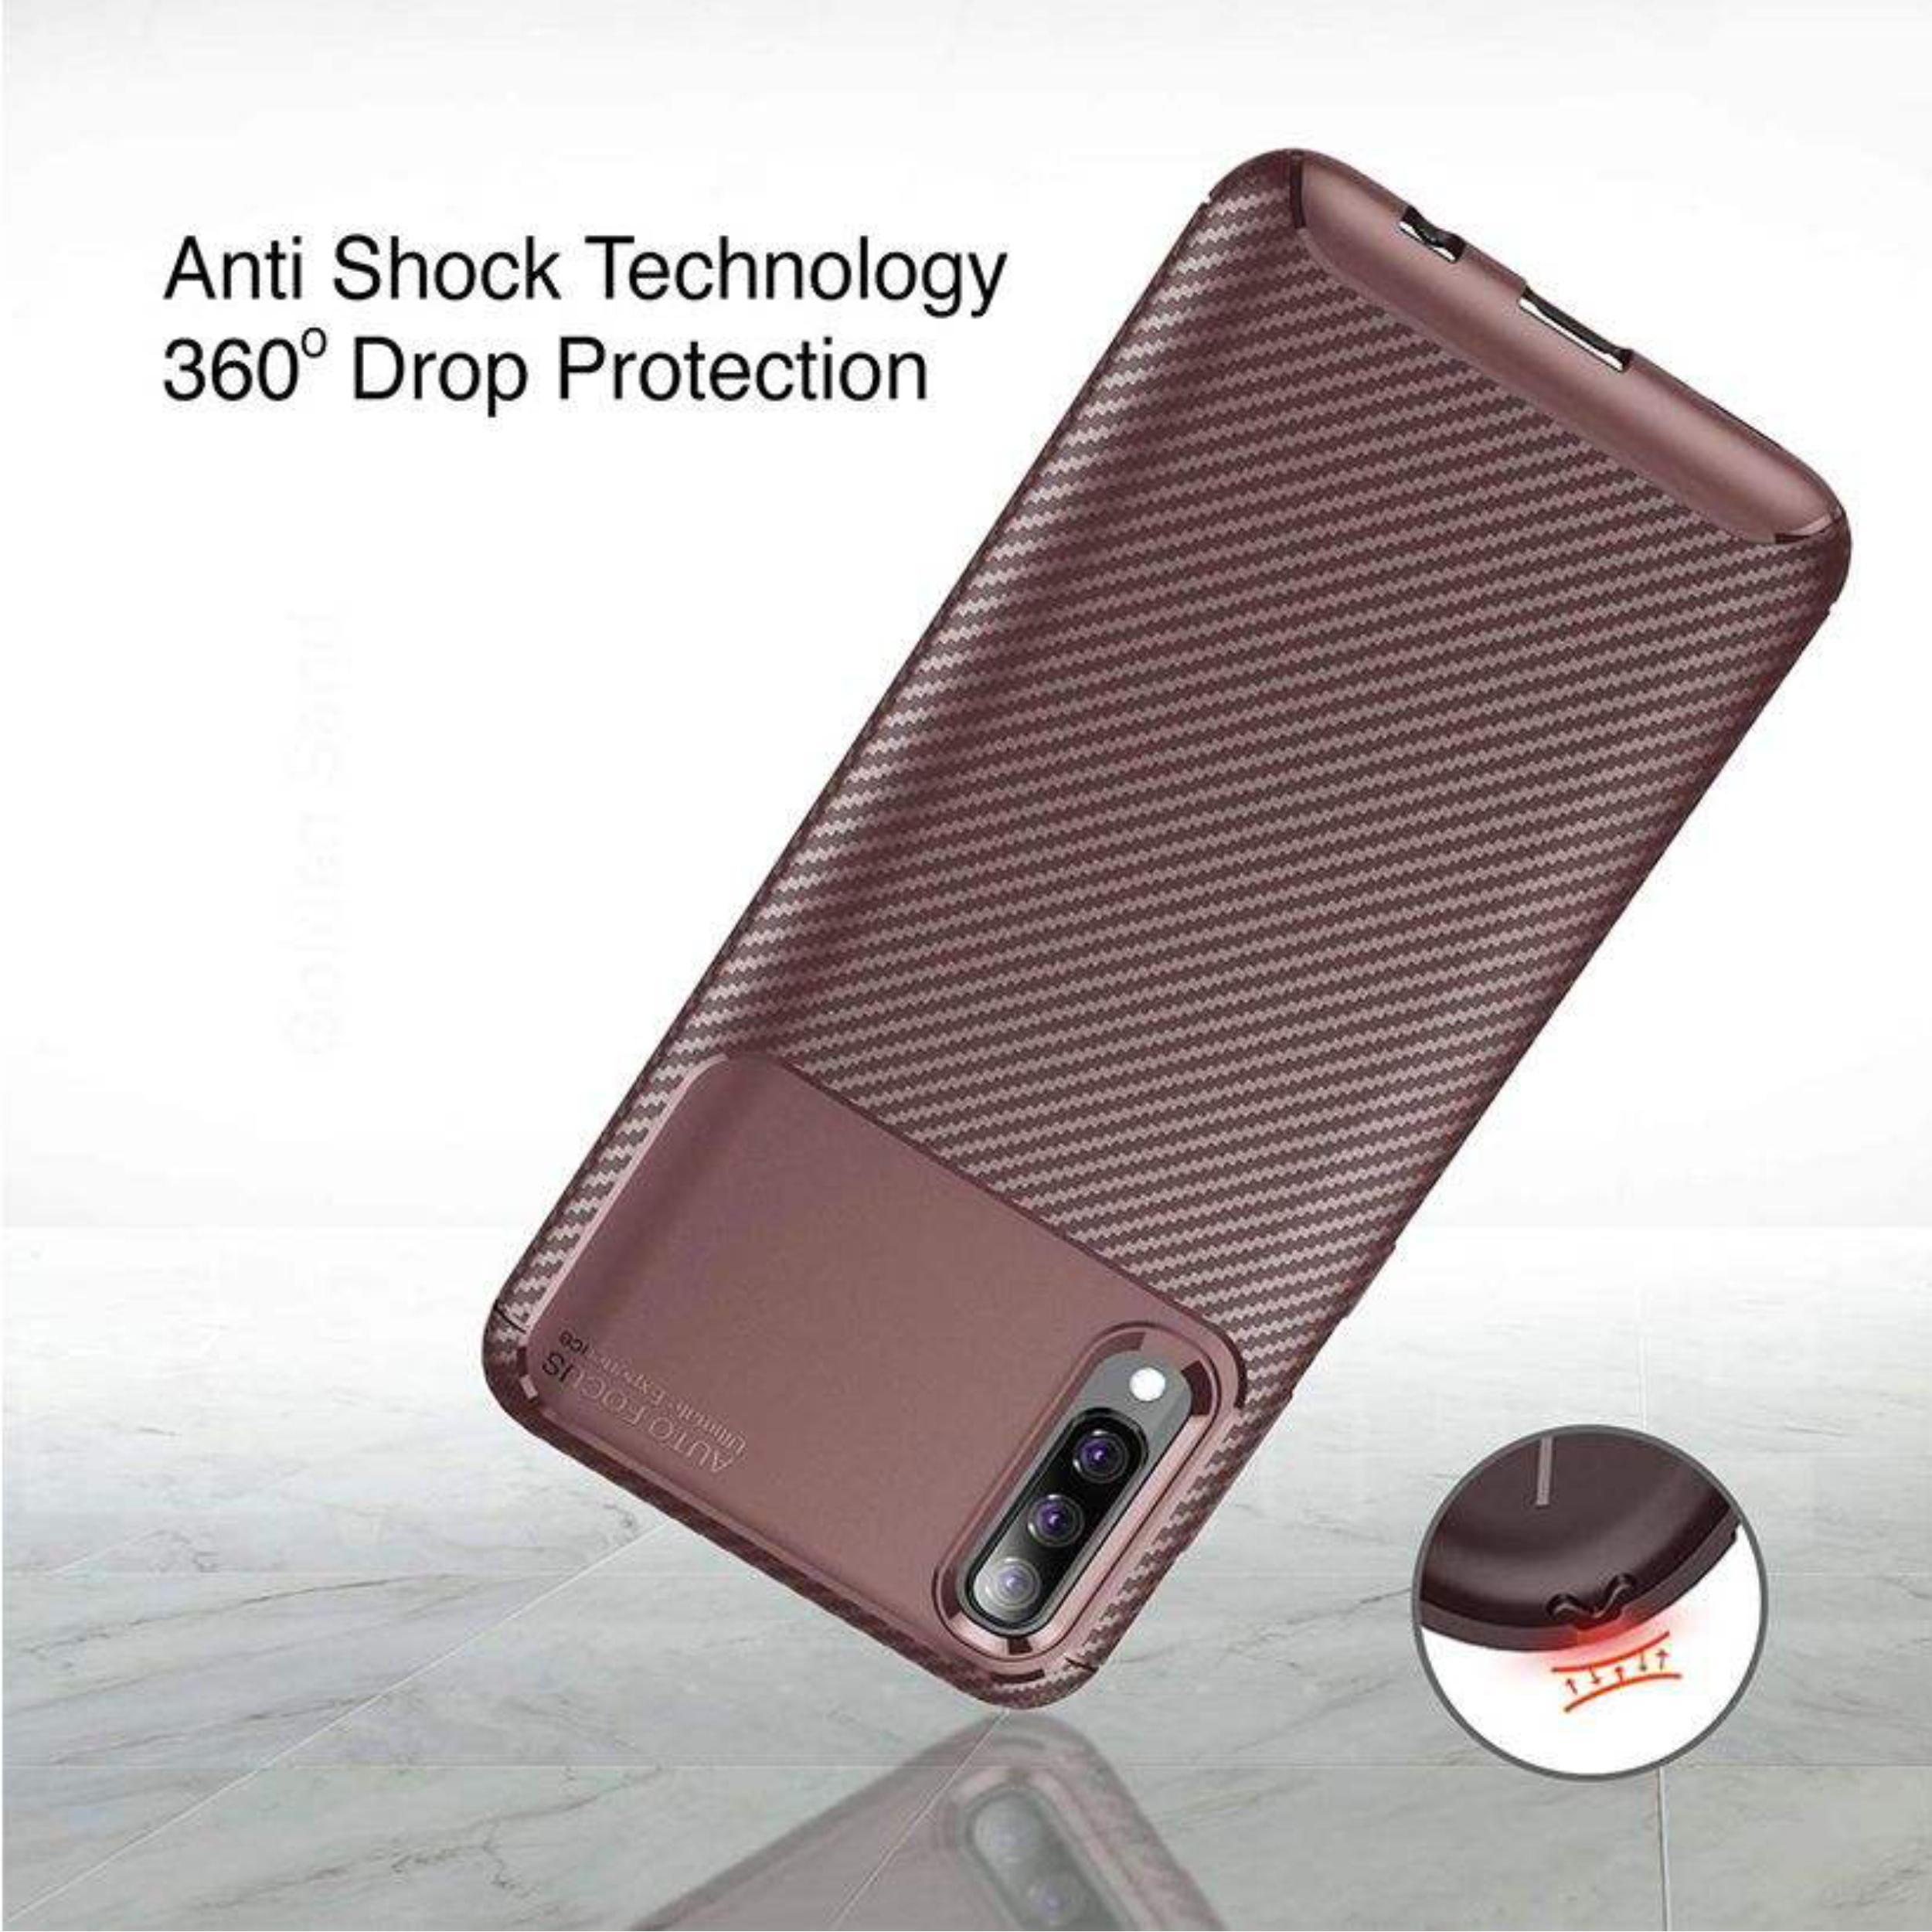 کاور لاین کینگ مدل A21 مناسب برای گوشی موبایل سامسونگ Galaxy A50/A50s/A30s thumb 2 8